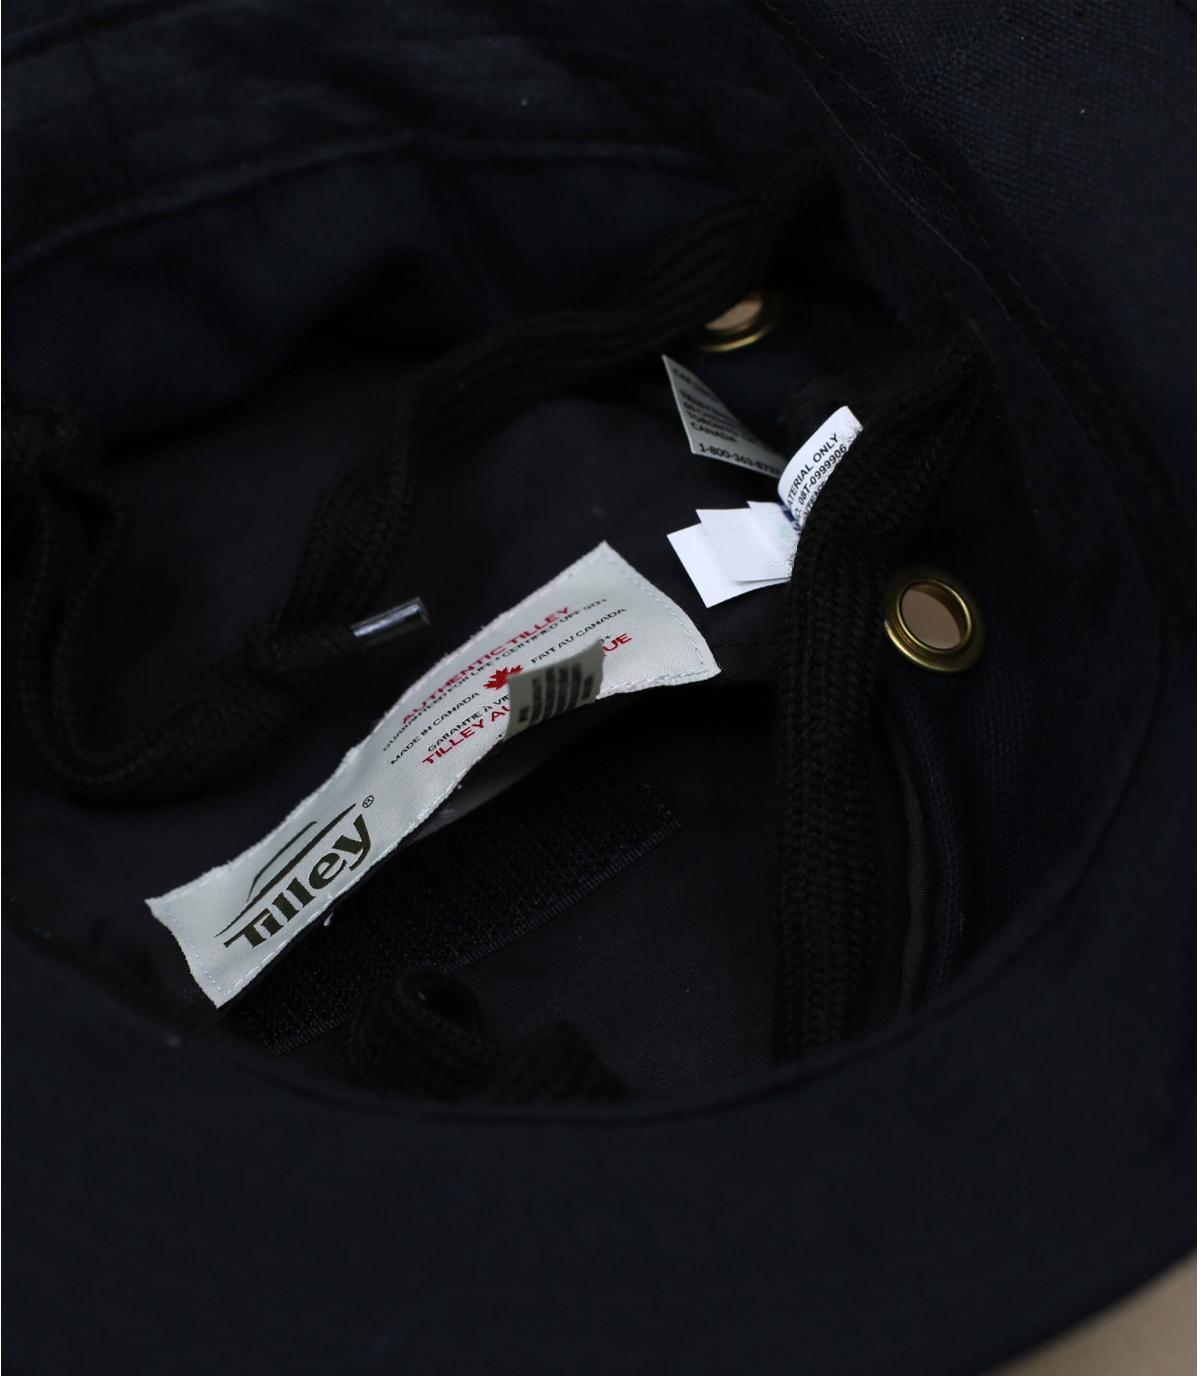 Details Iconic T1 black - afbeeling 4